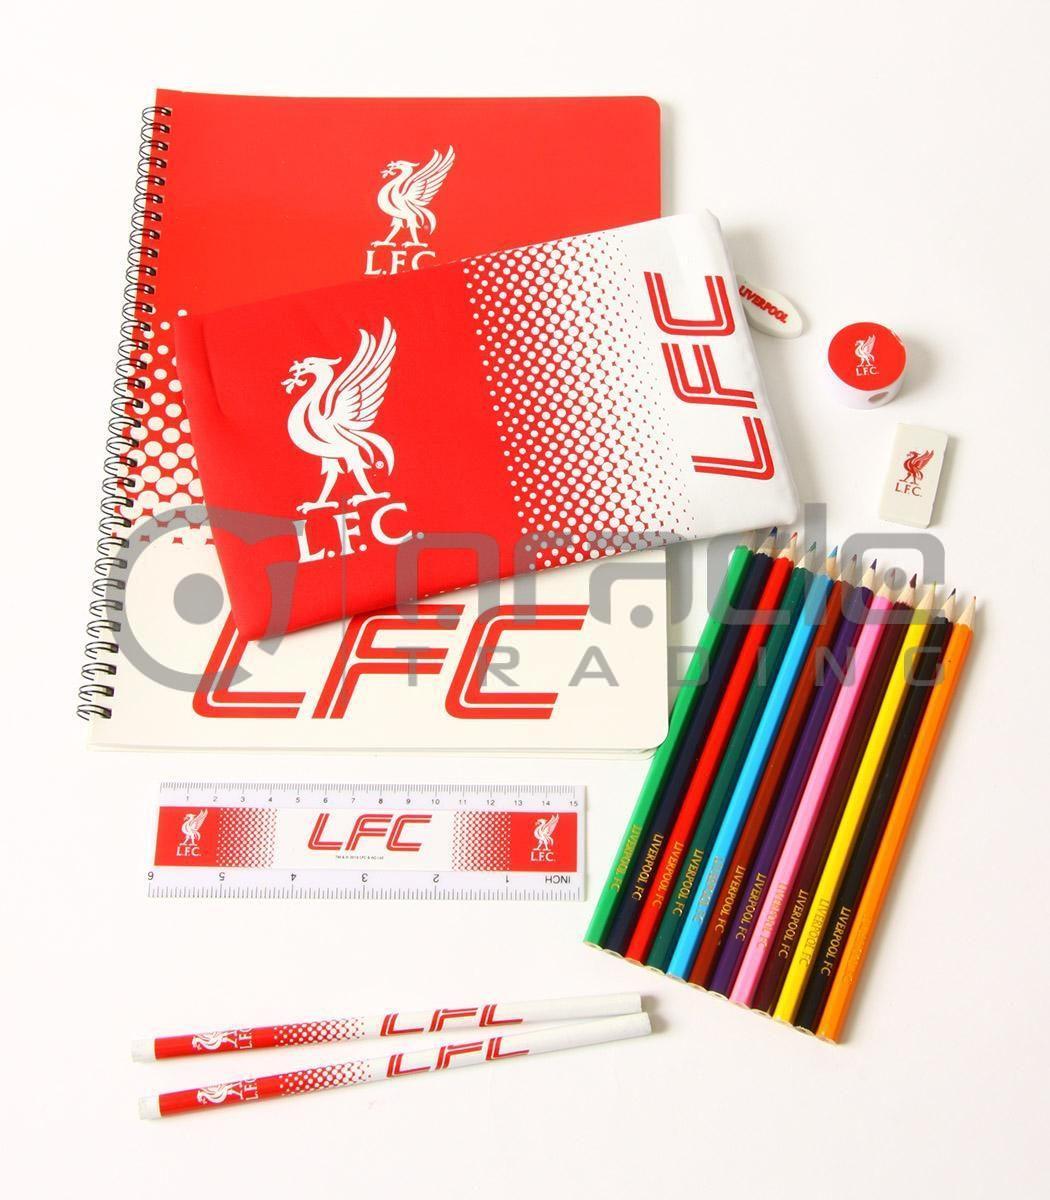 Liverpool Ultimate Stationery Set